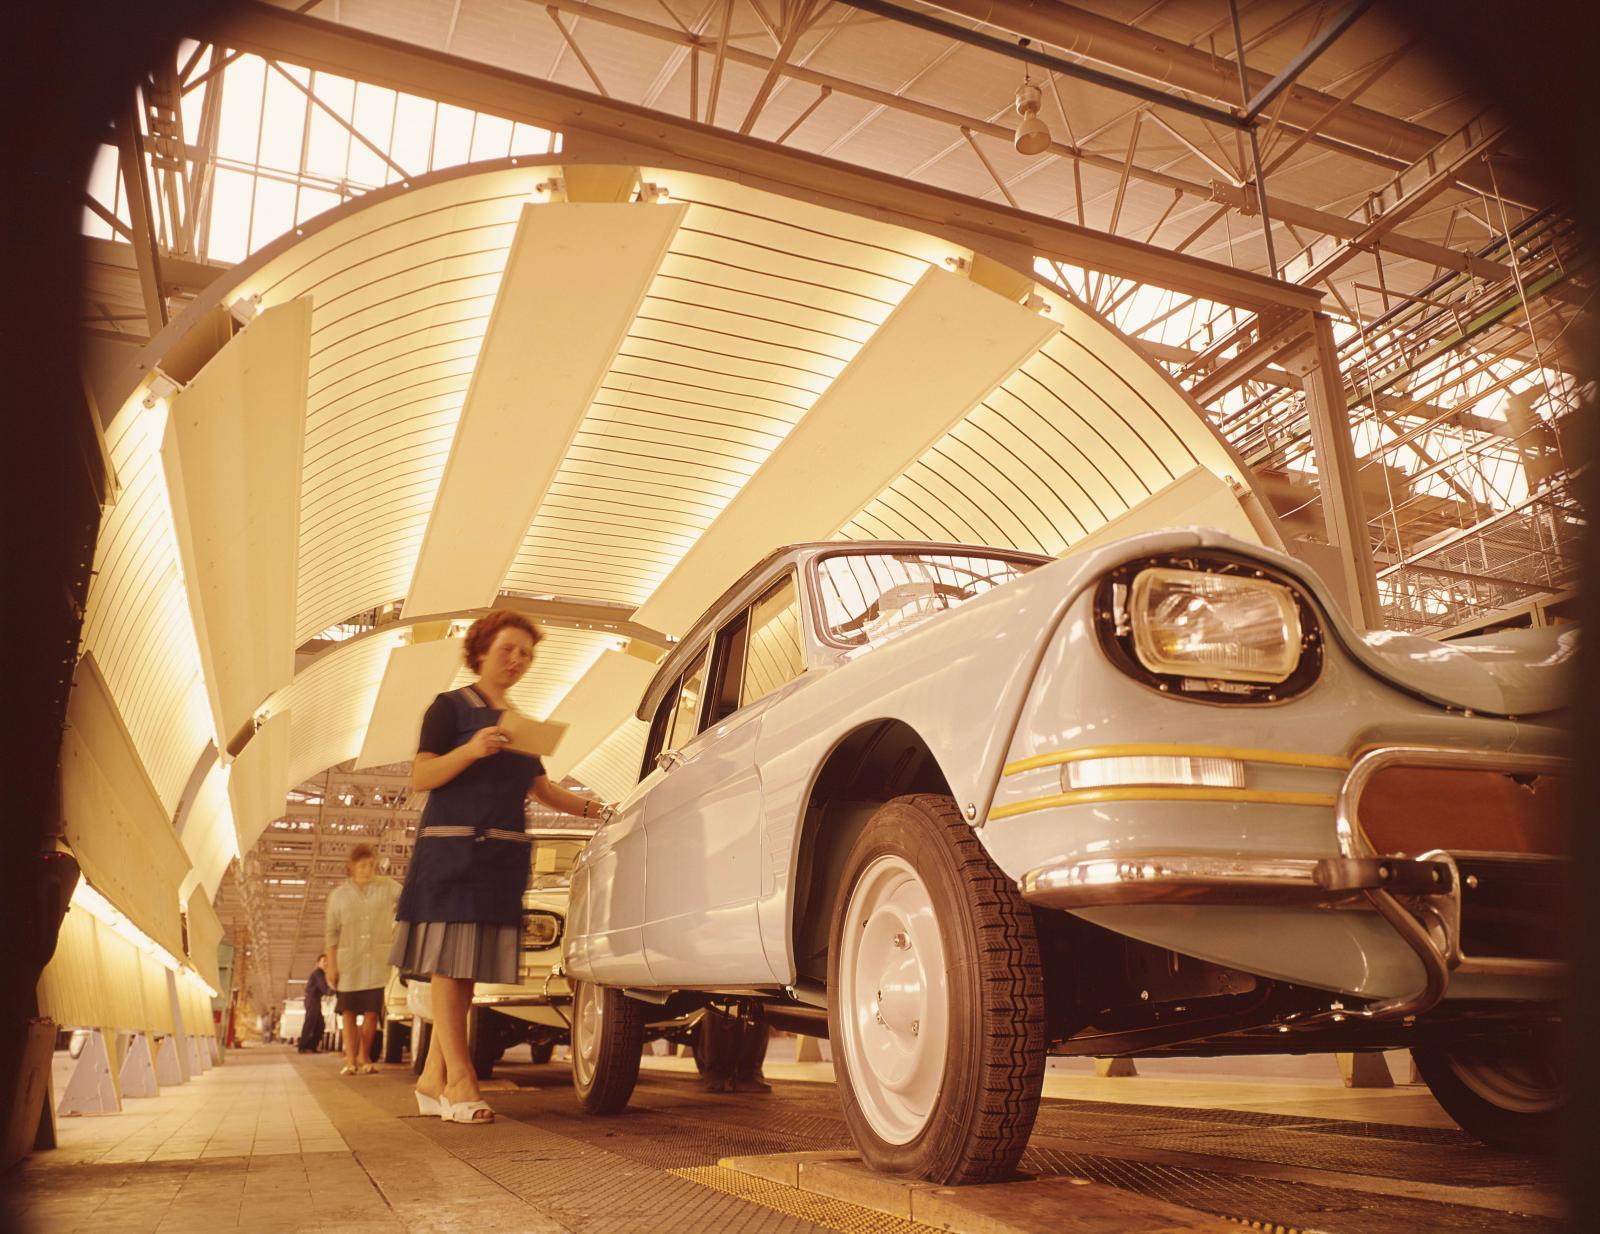 AMI Tunnel de contrôle Rennes 1965